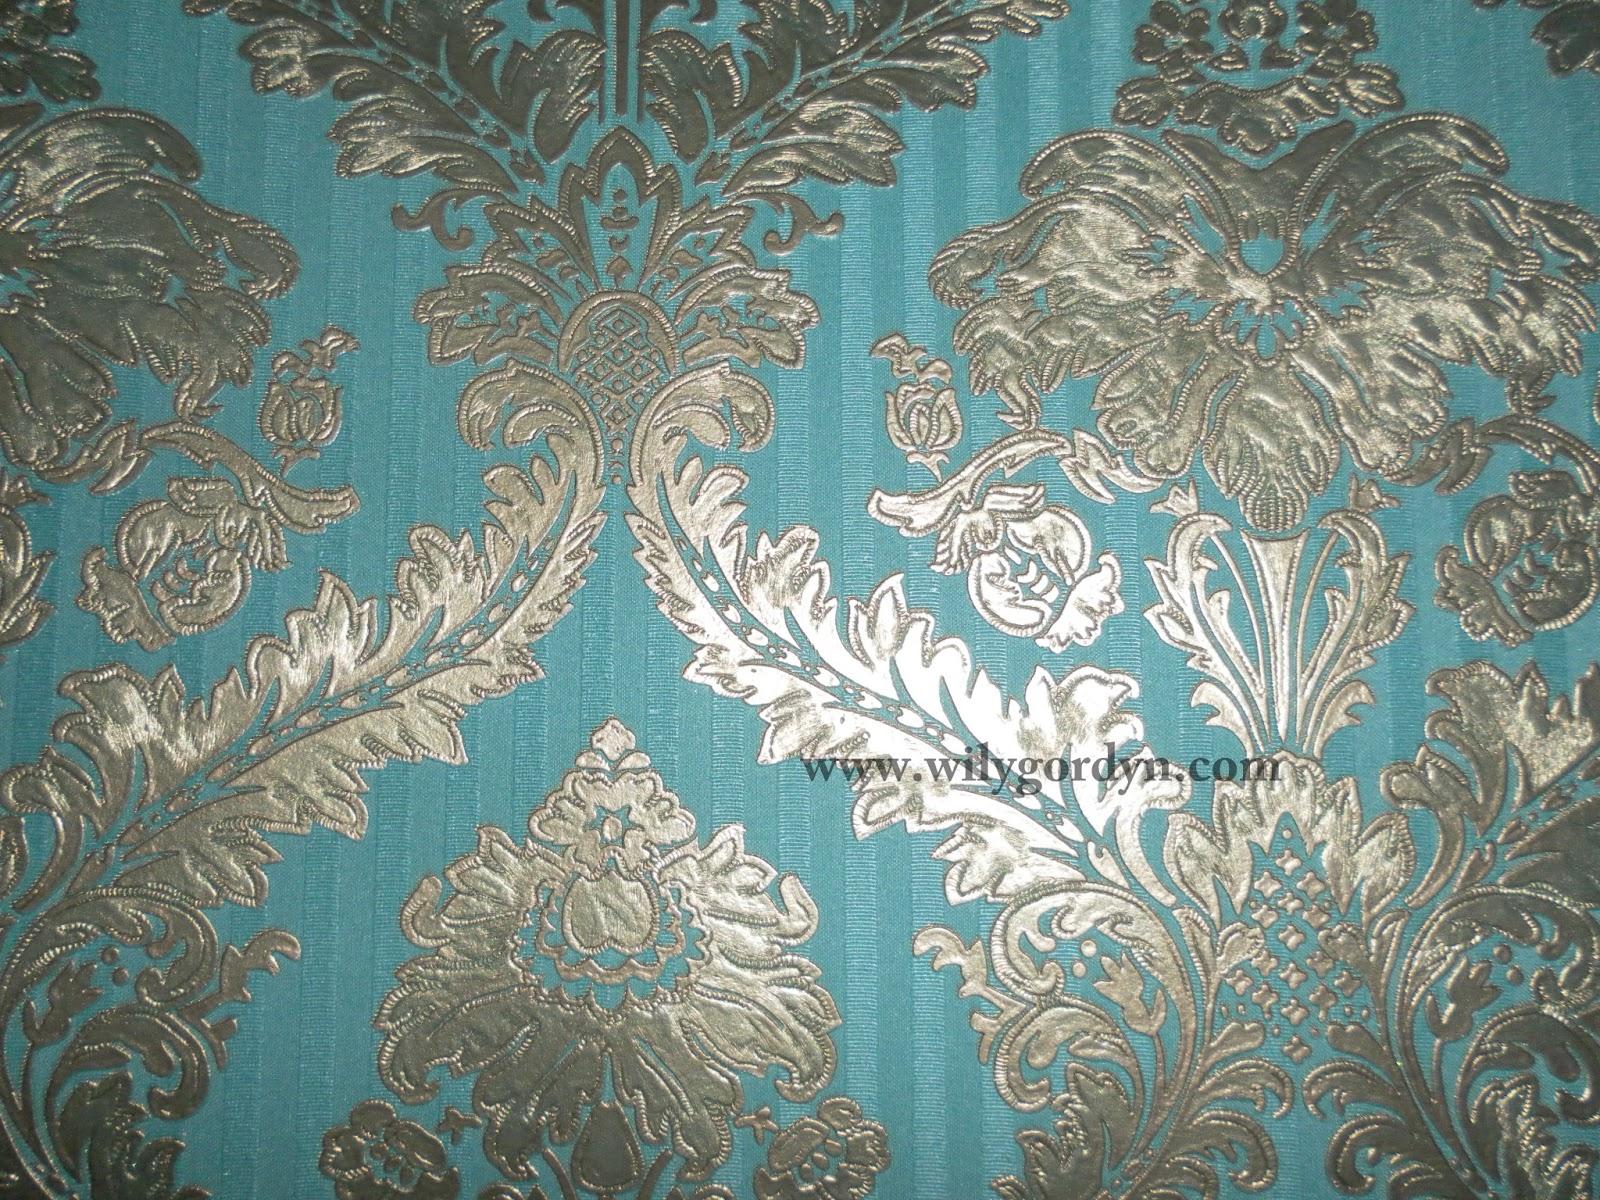 Contoh Motif Wallpaper Dinding Klasik Wily Gordyn